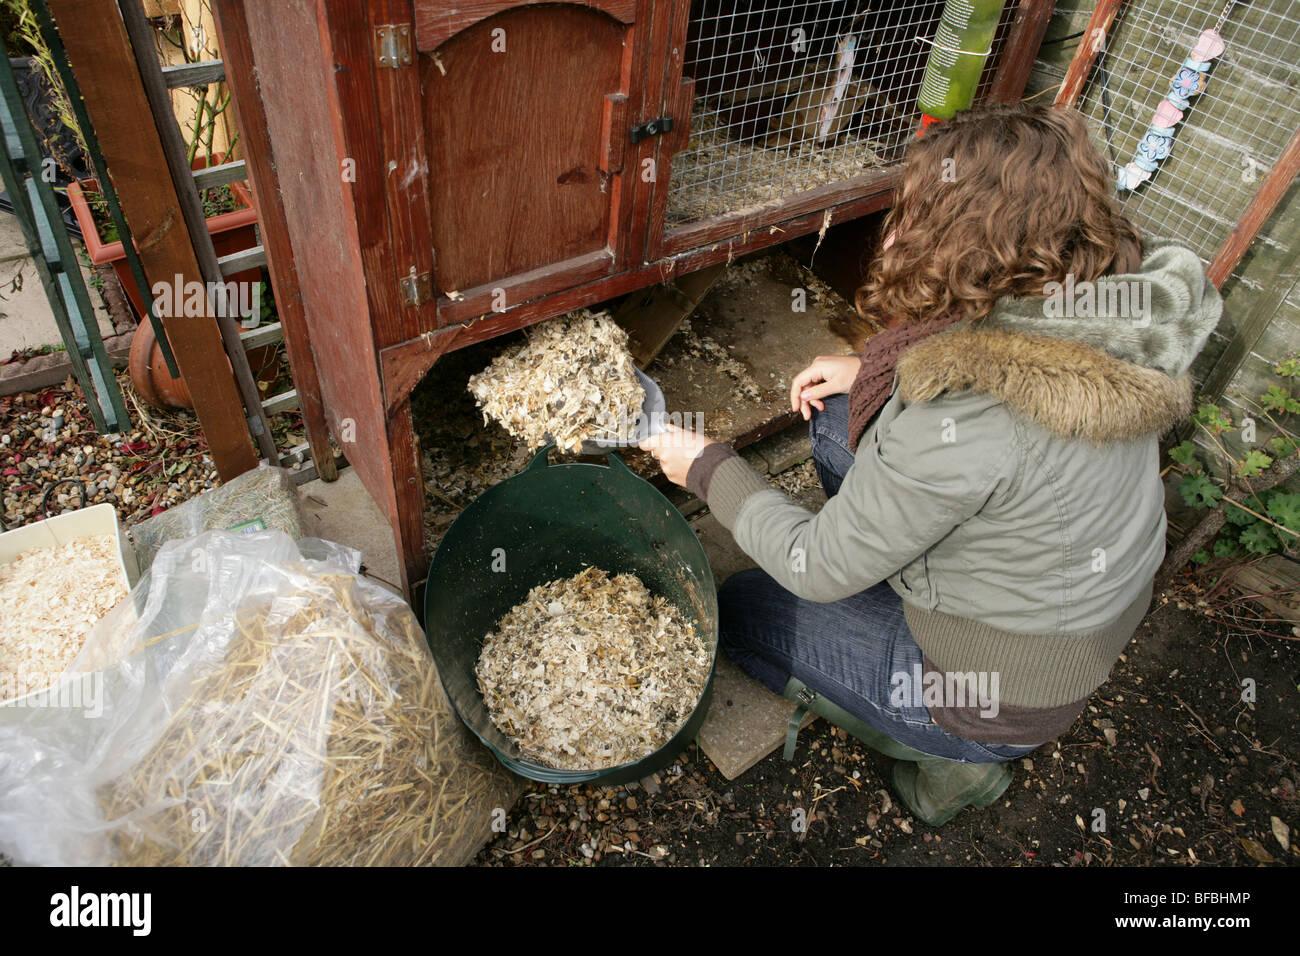 Women Cleaning Rabbit Hutch Garden Stock Photo 26685590